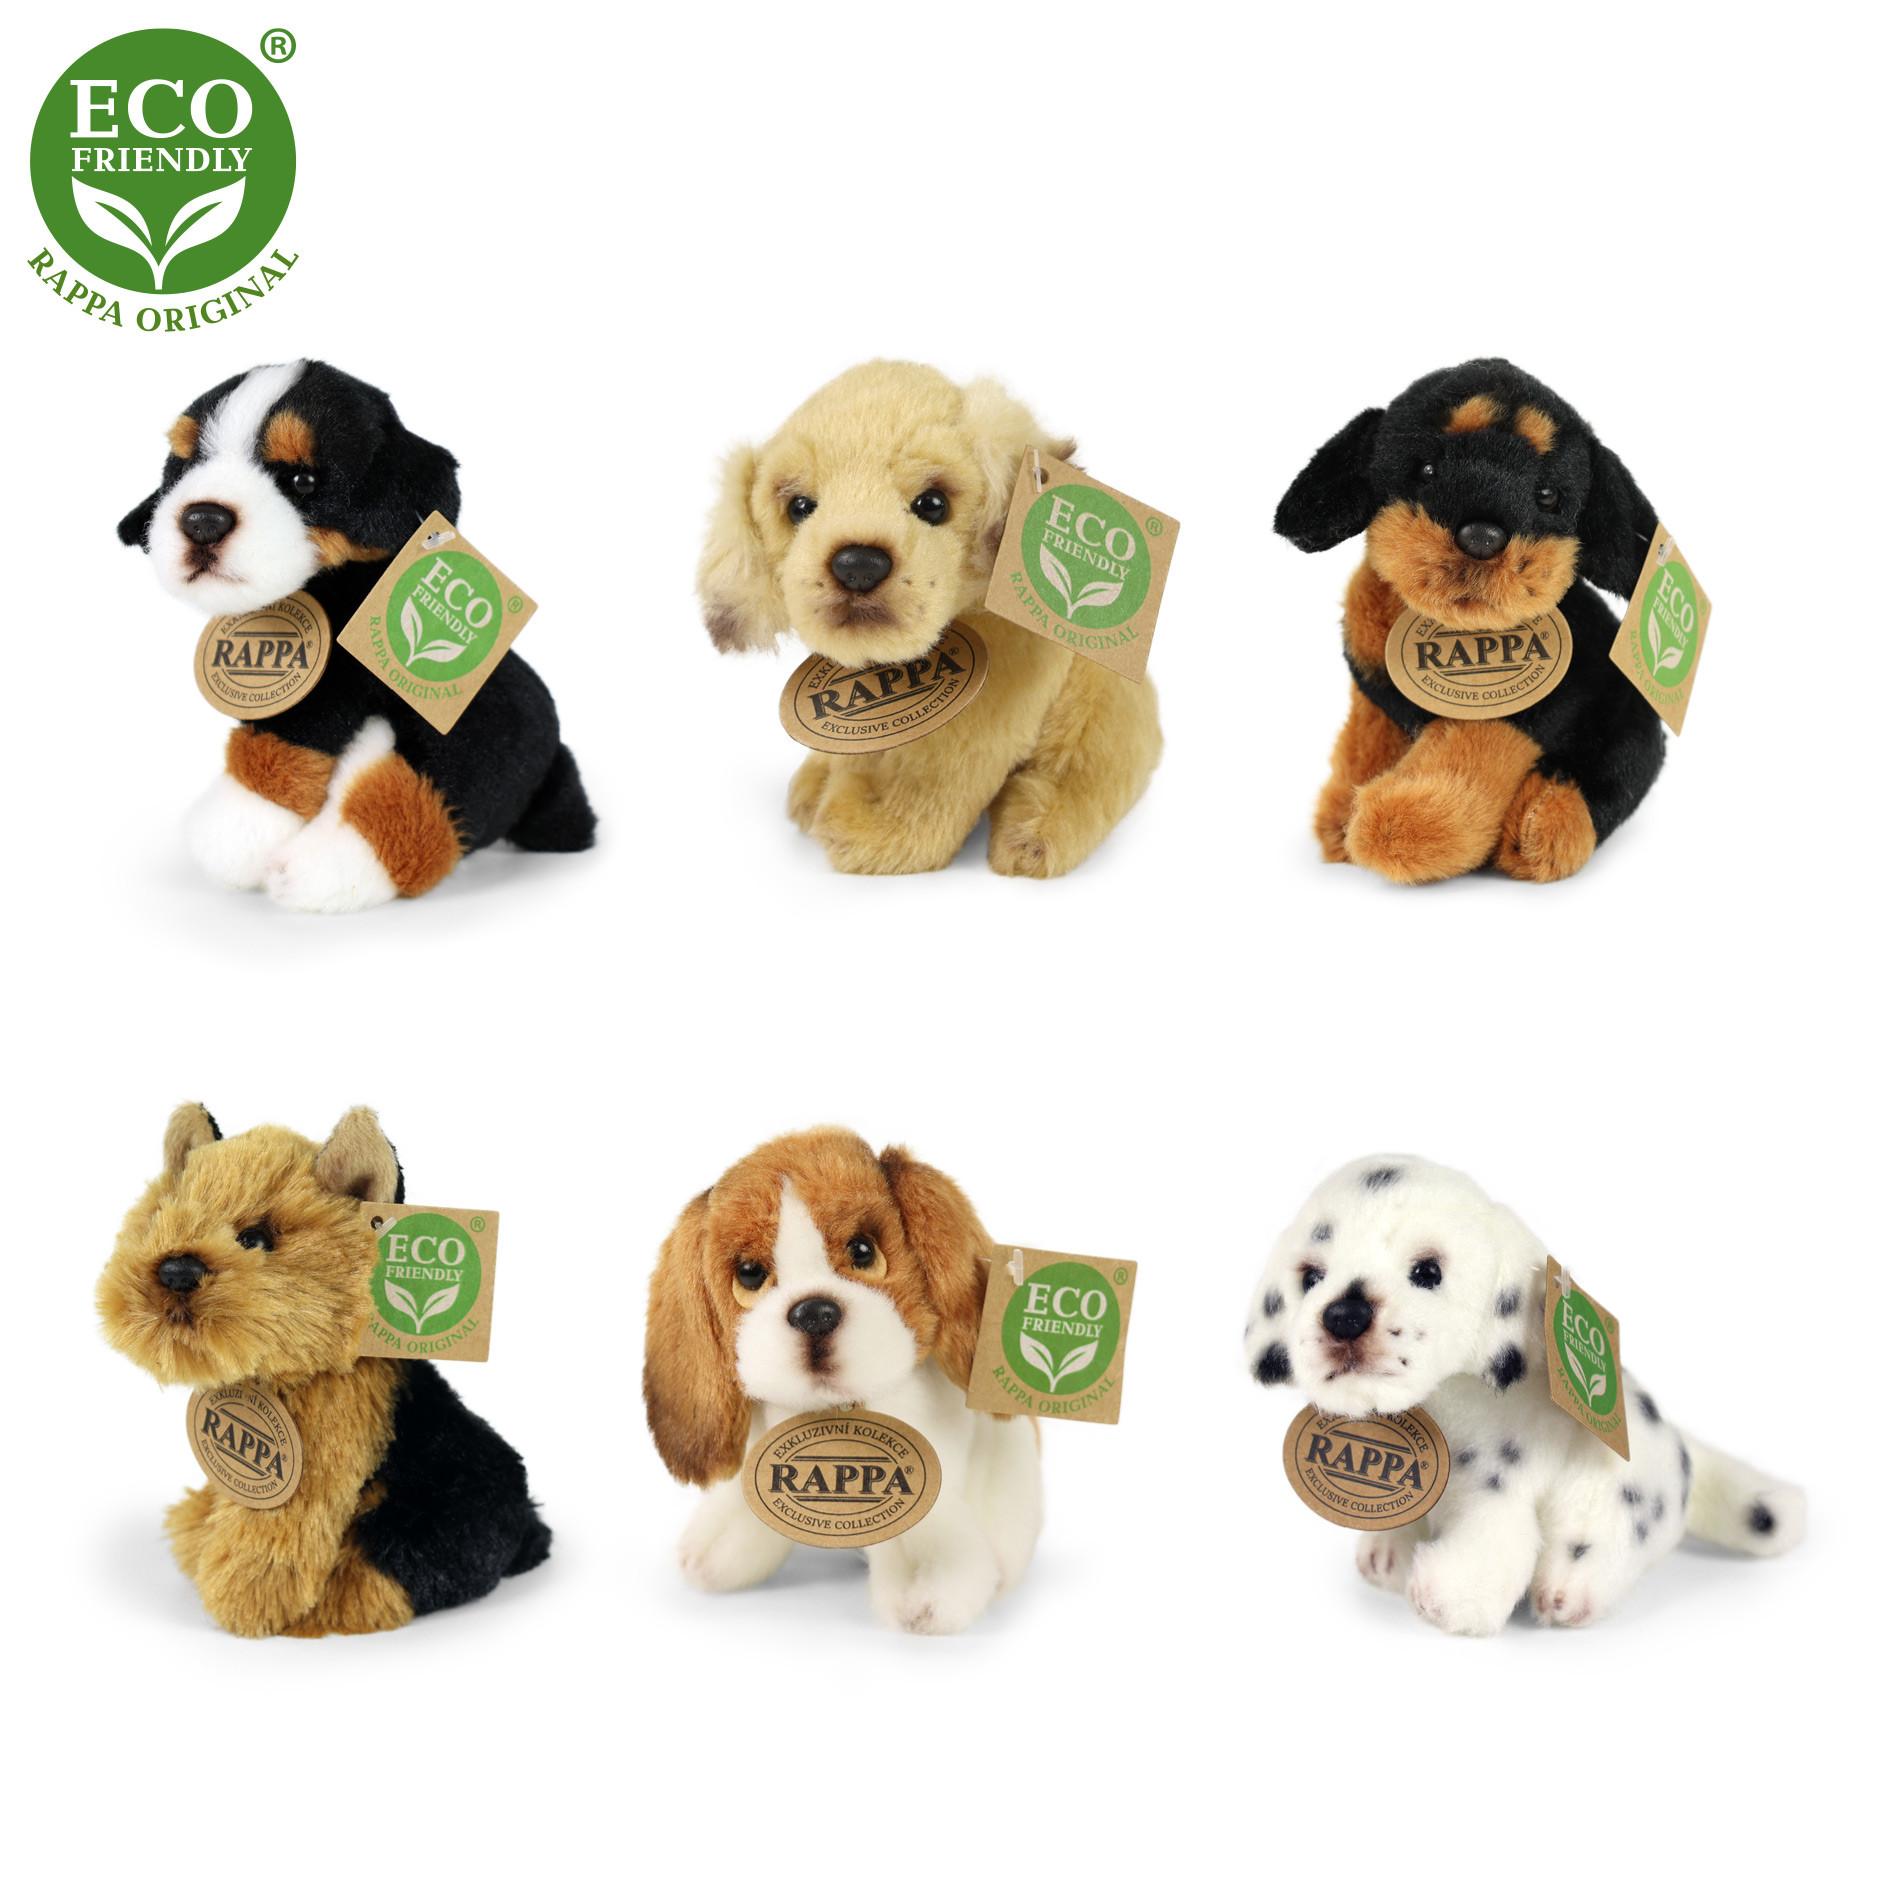 the plush dog 11 cm, 6 types